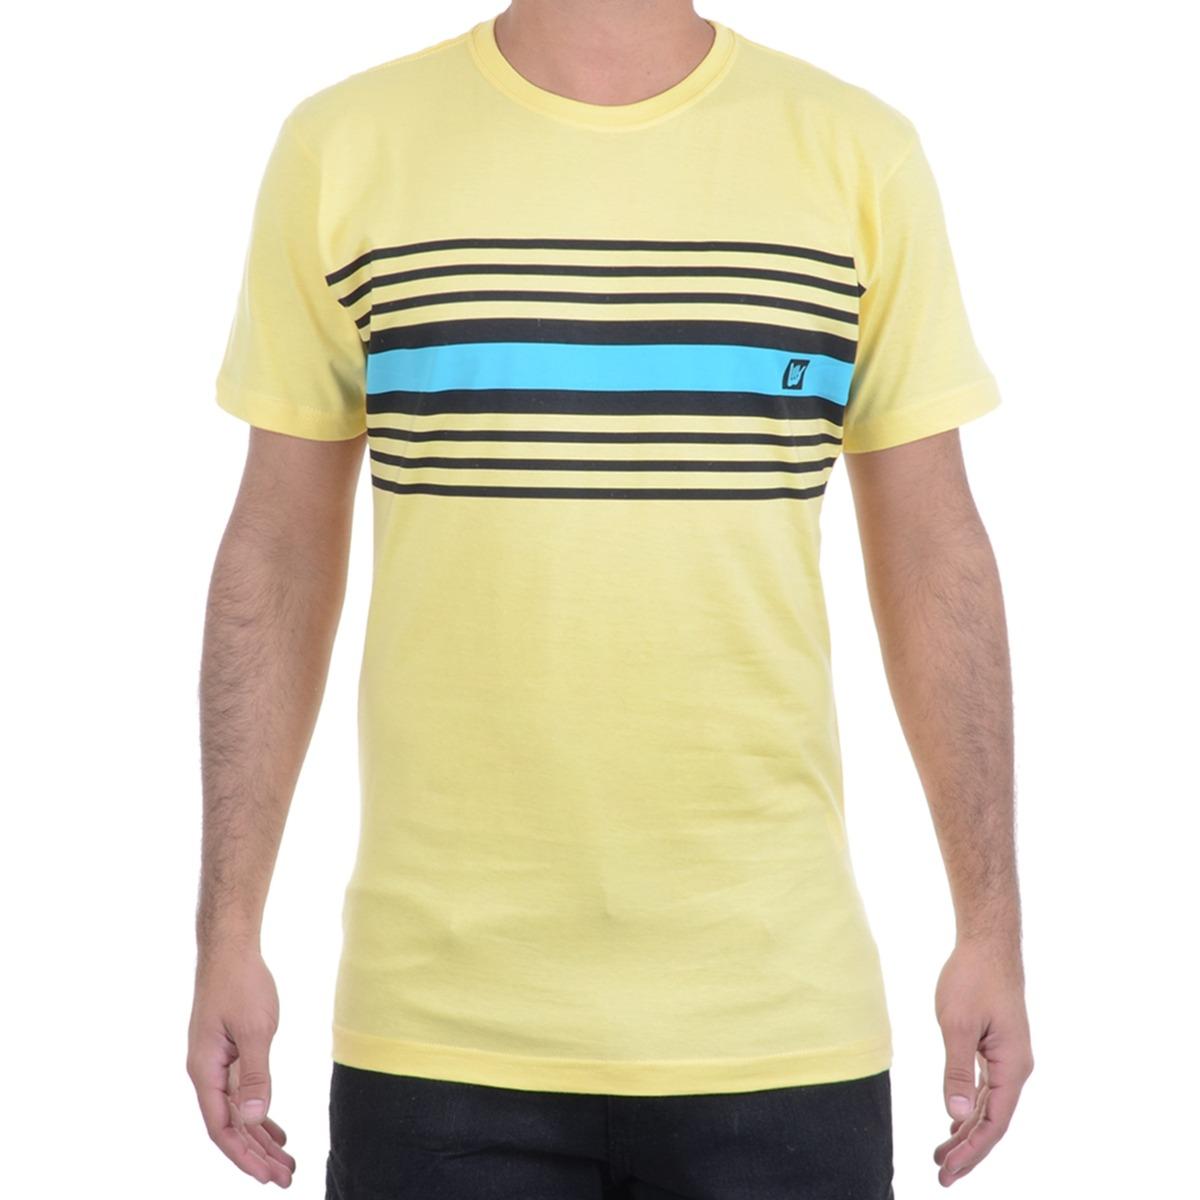 467dadc0c9 camiseta masculina hang loose classic. Carregando zoom.